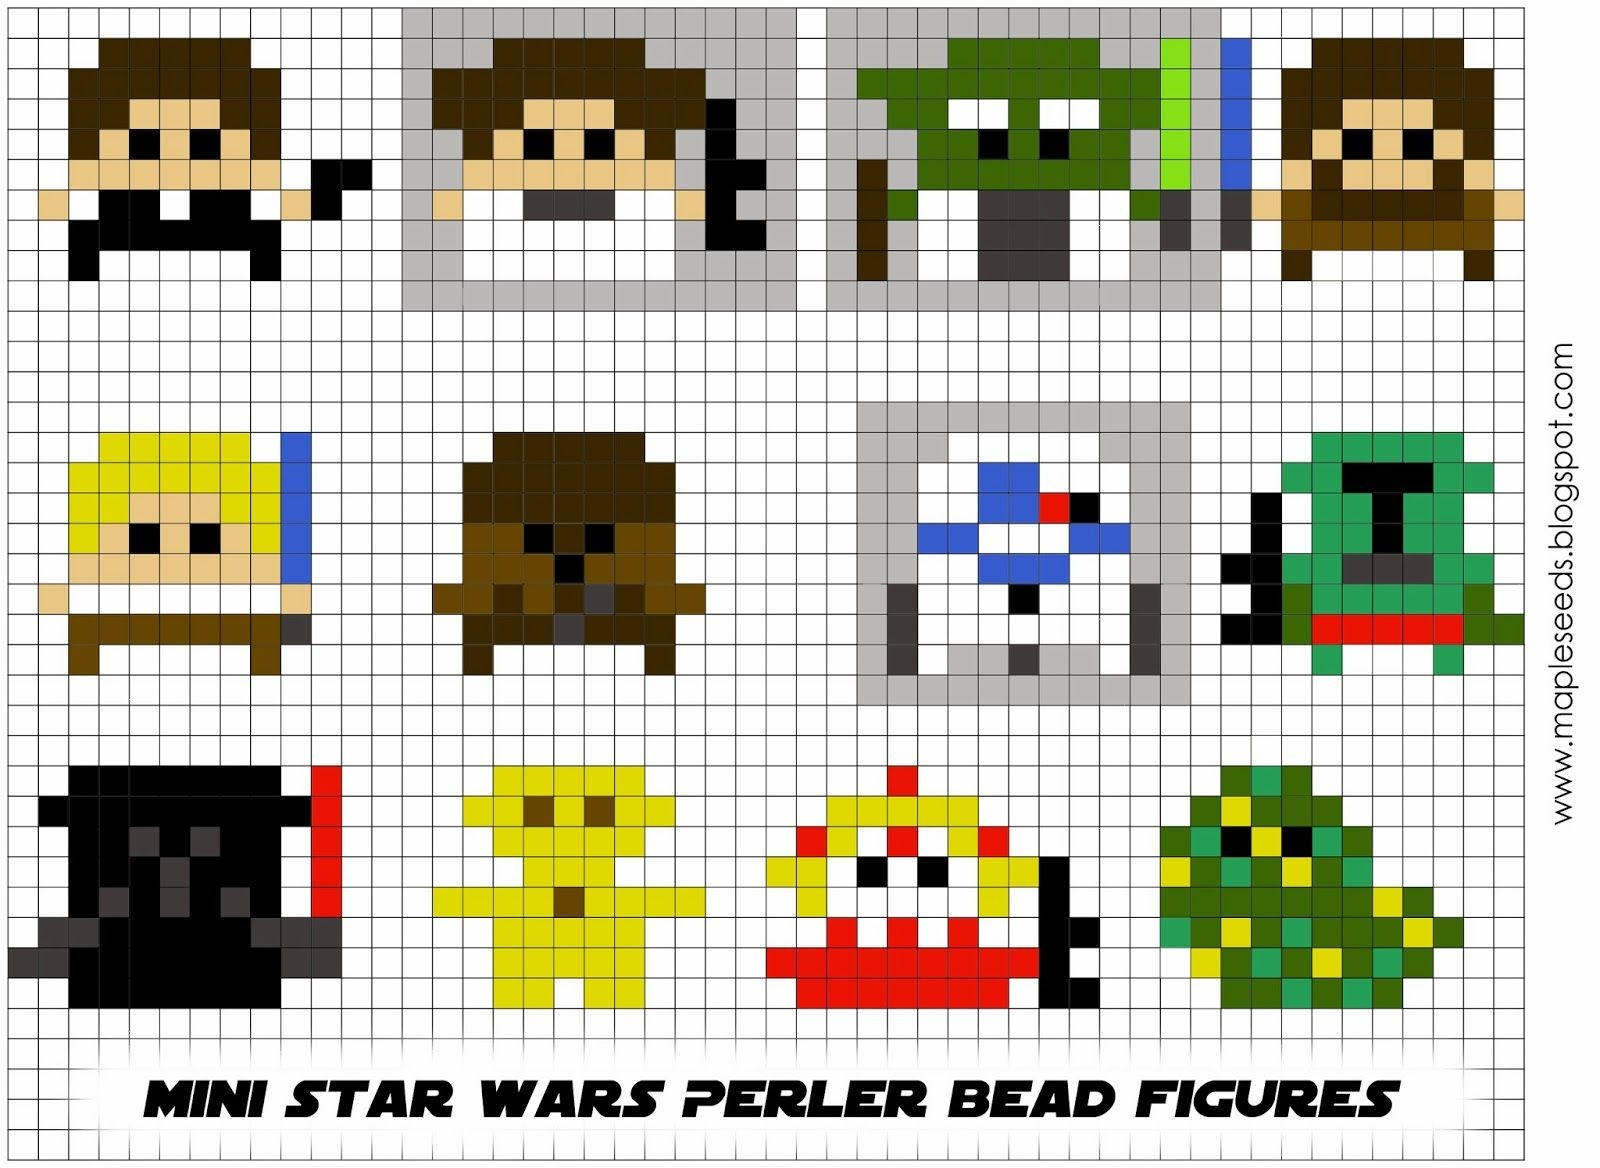 Free Printable 3-D Perler Bead Patterns | Don't Forget To Download - Pony Bead Patterns Free Printable